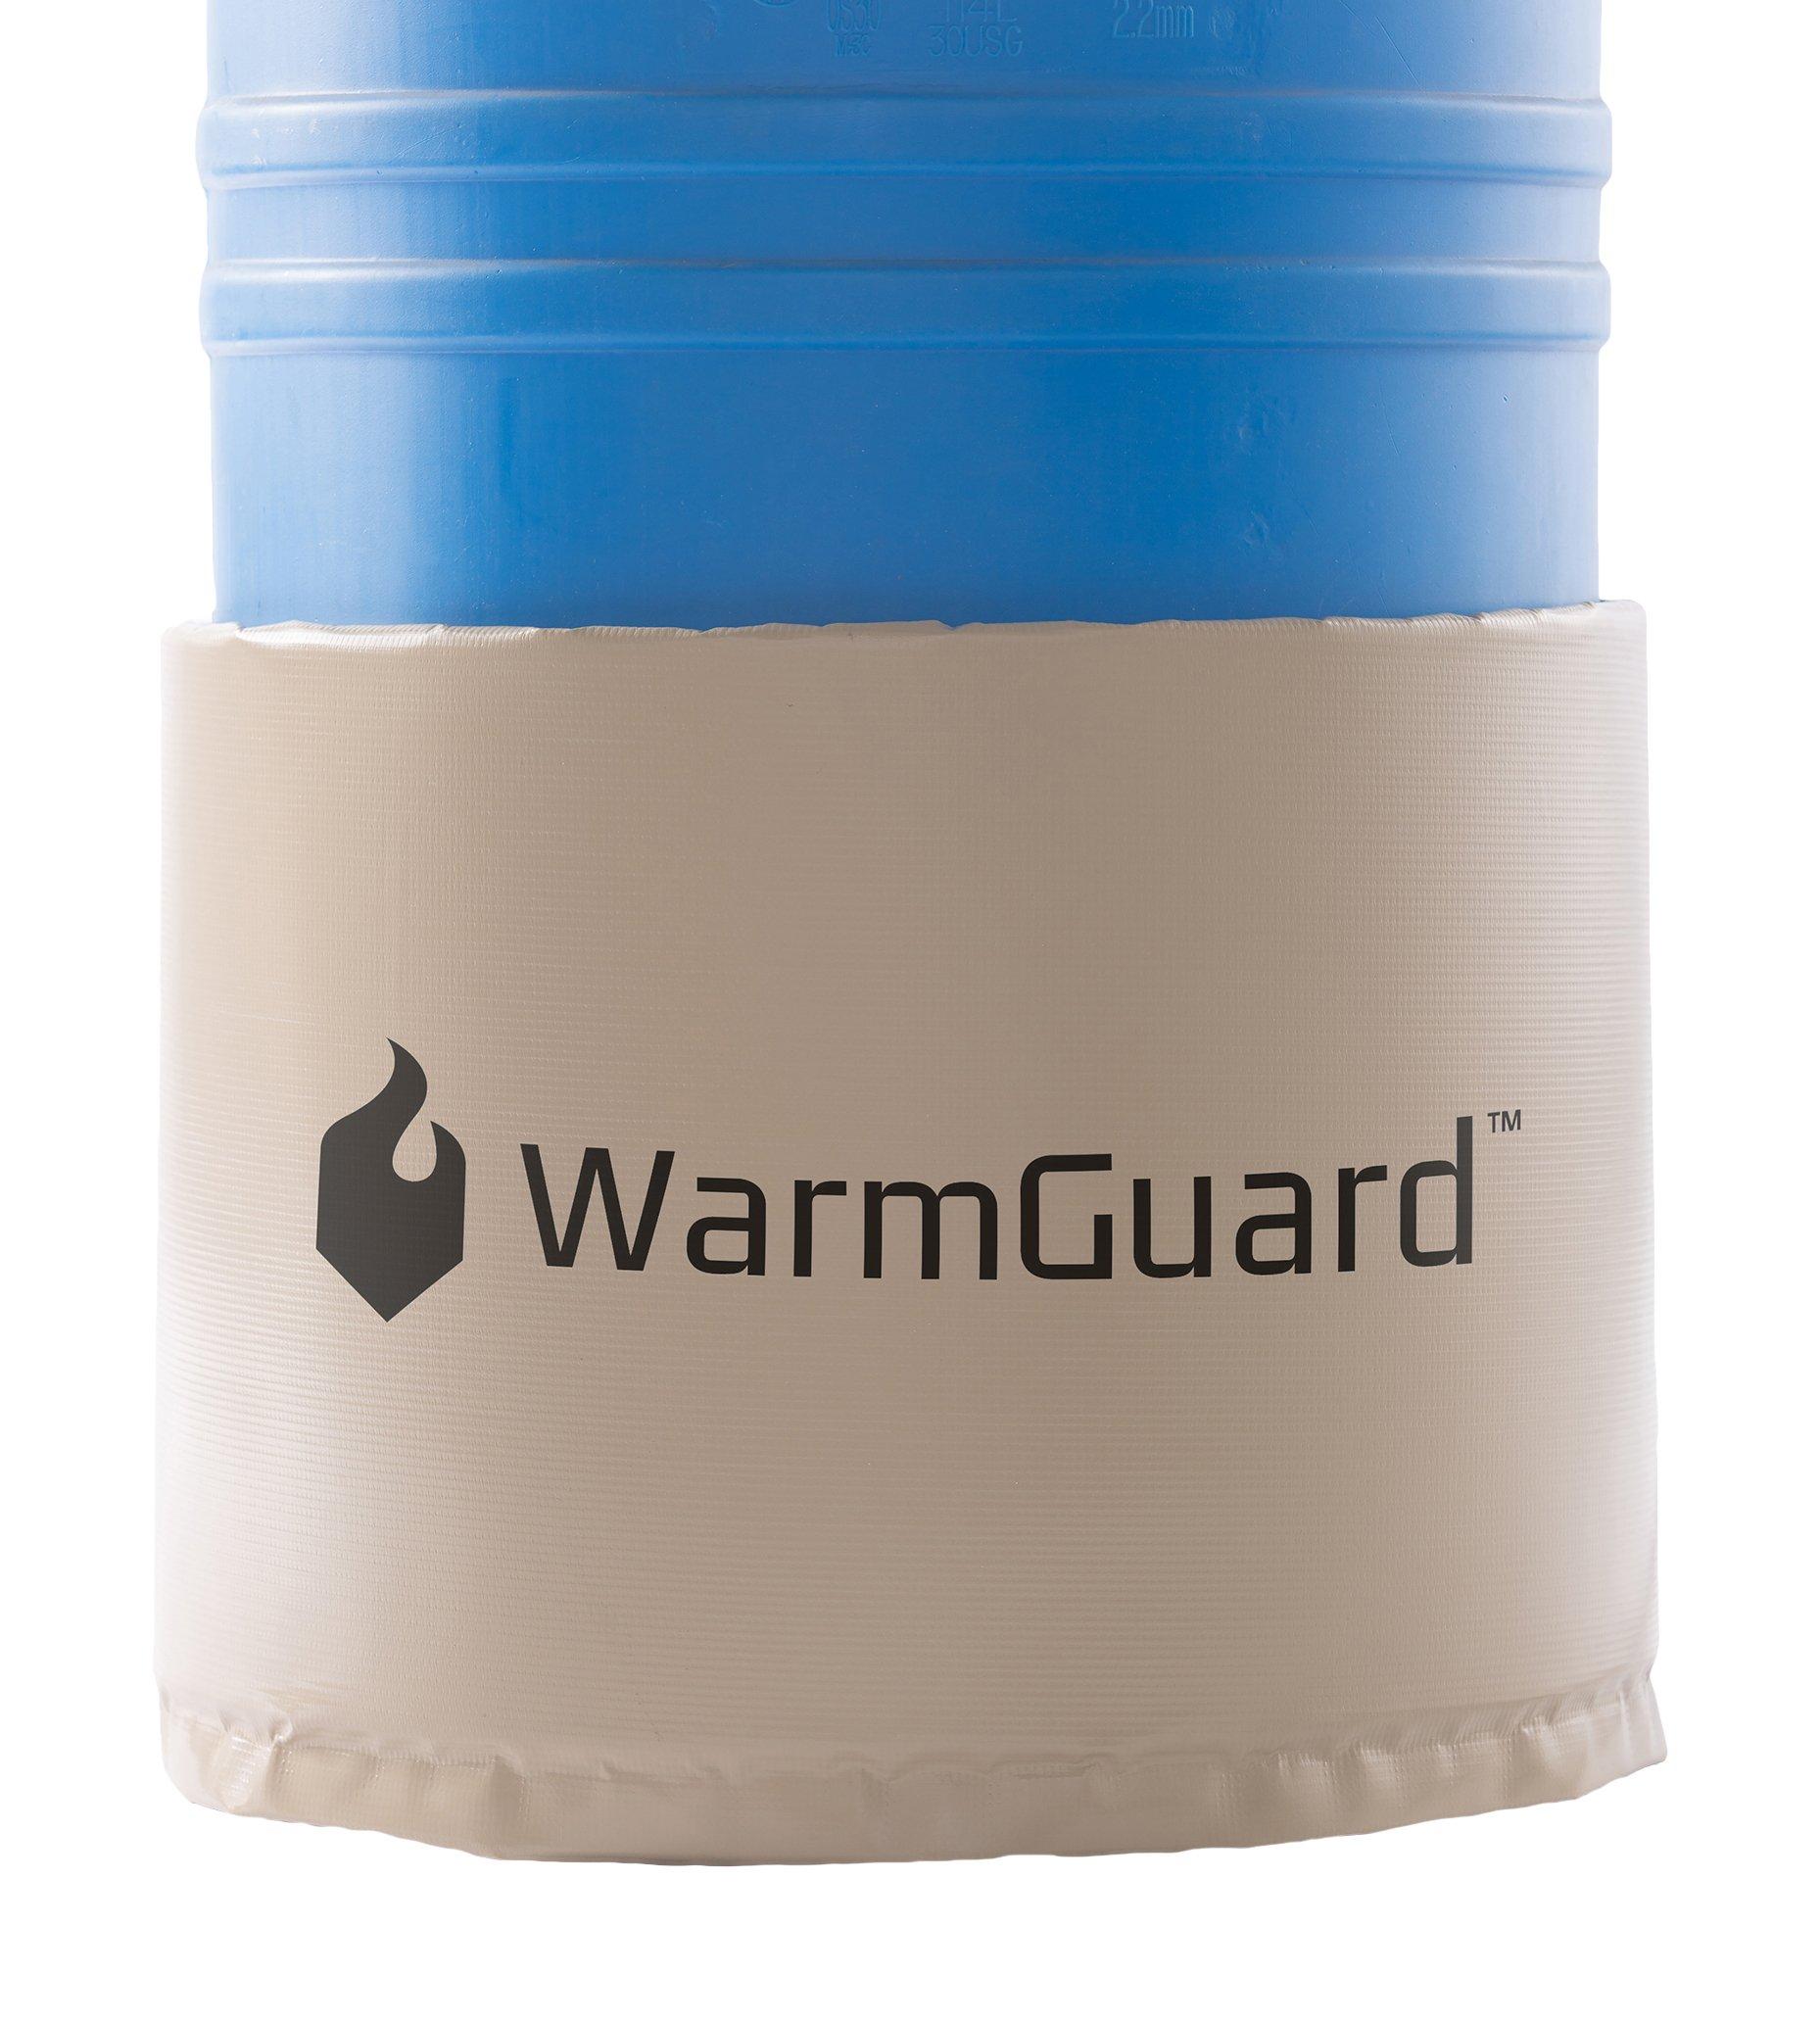 WarmGuard WG30 Insulated Drum Band Heater - Barrel Heater, Fixed Internal Thermostat Max Temp 145 F